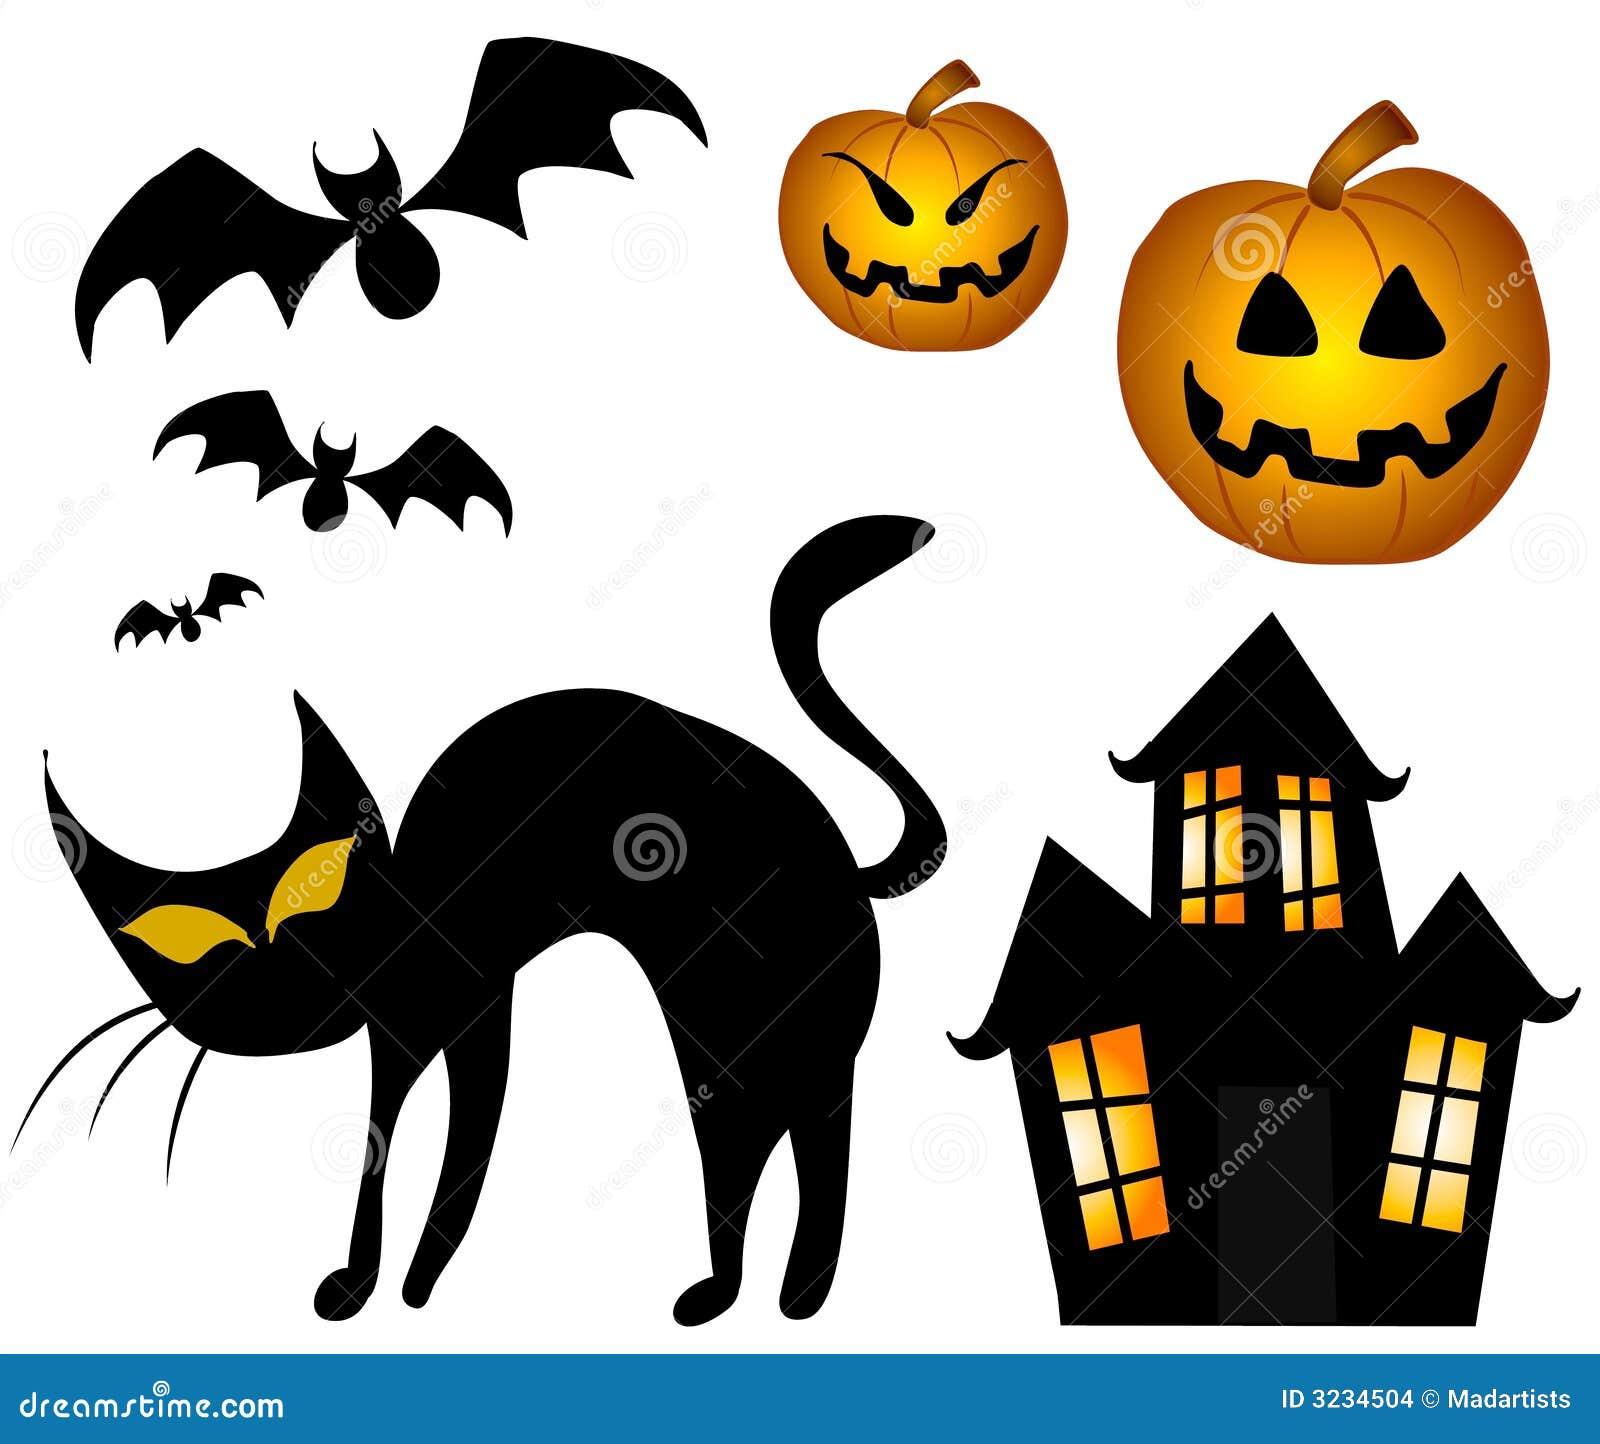 Halloween Cat Pumpkins Haunted House Stock Photos - Image: 33481163